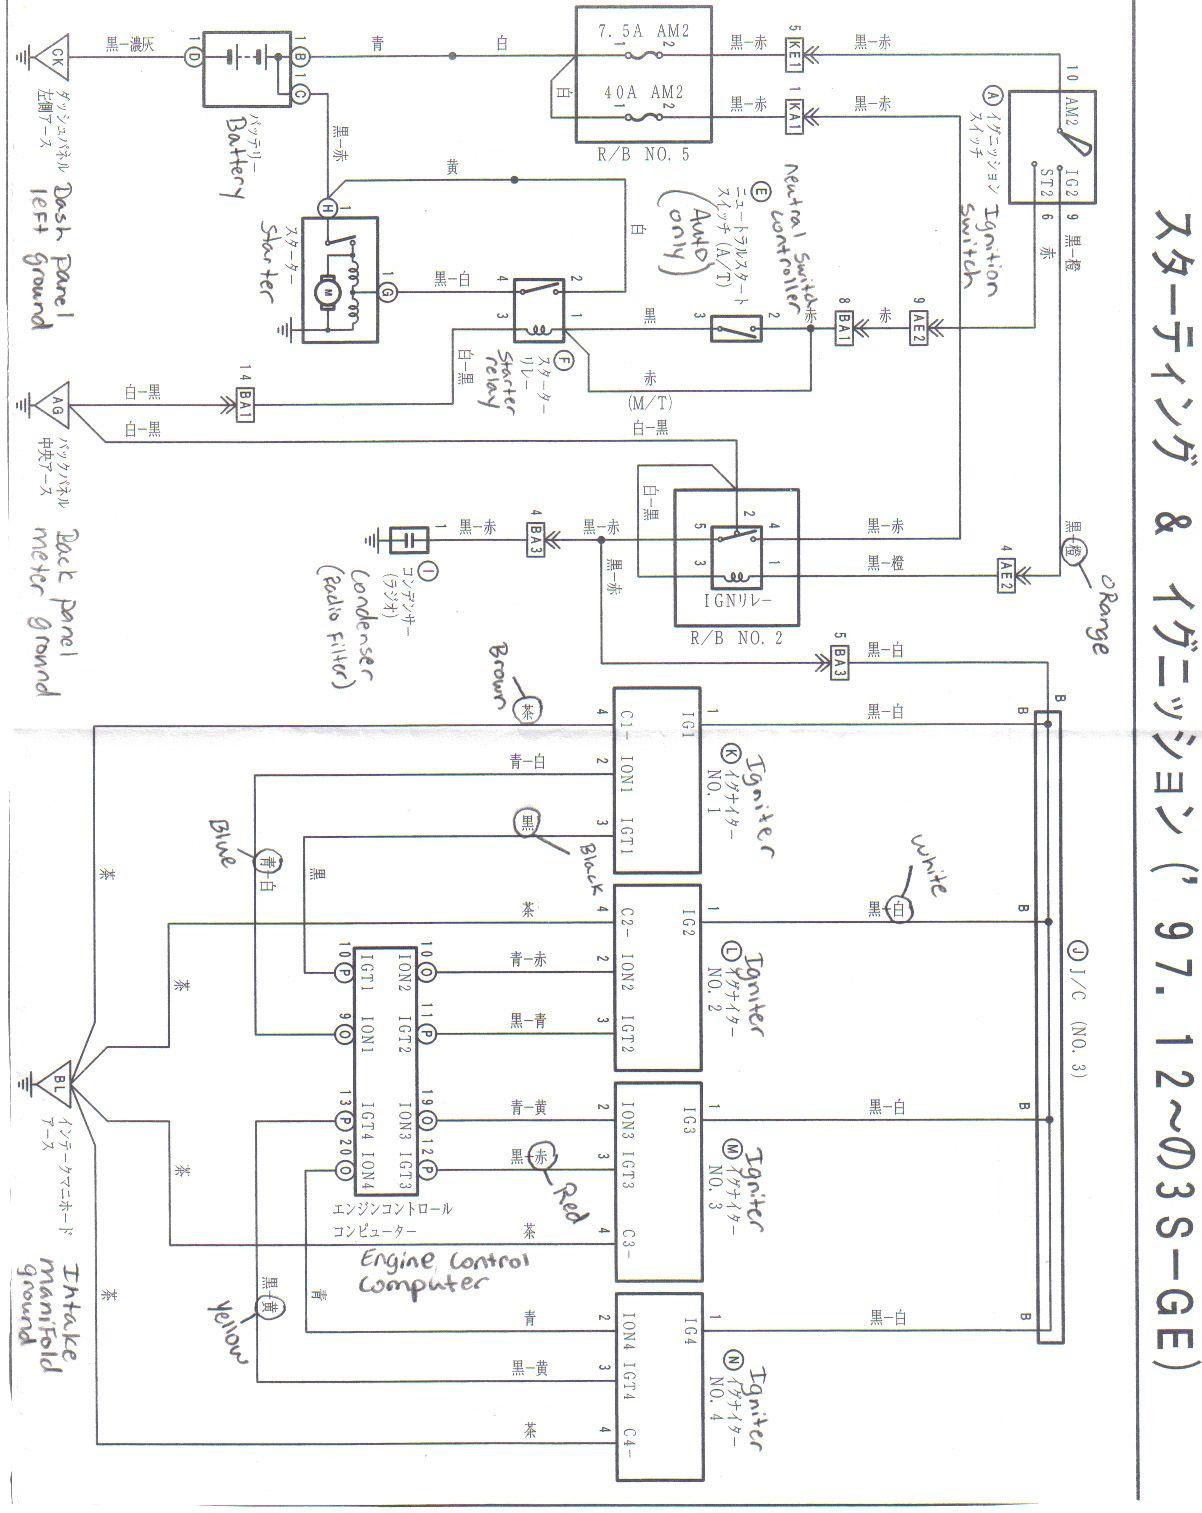 [DIAGRAM] 3sge Wiring Diagram